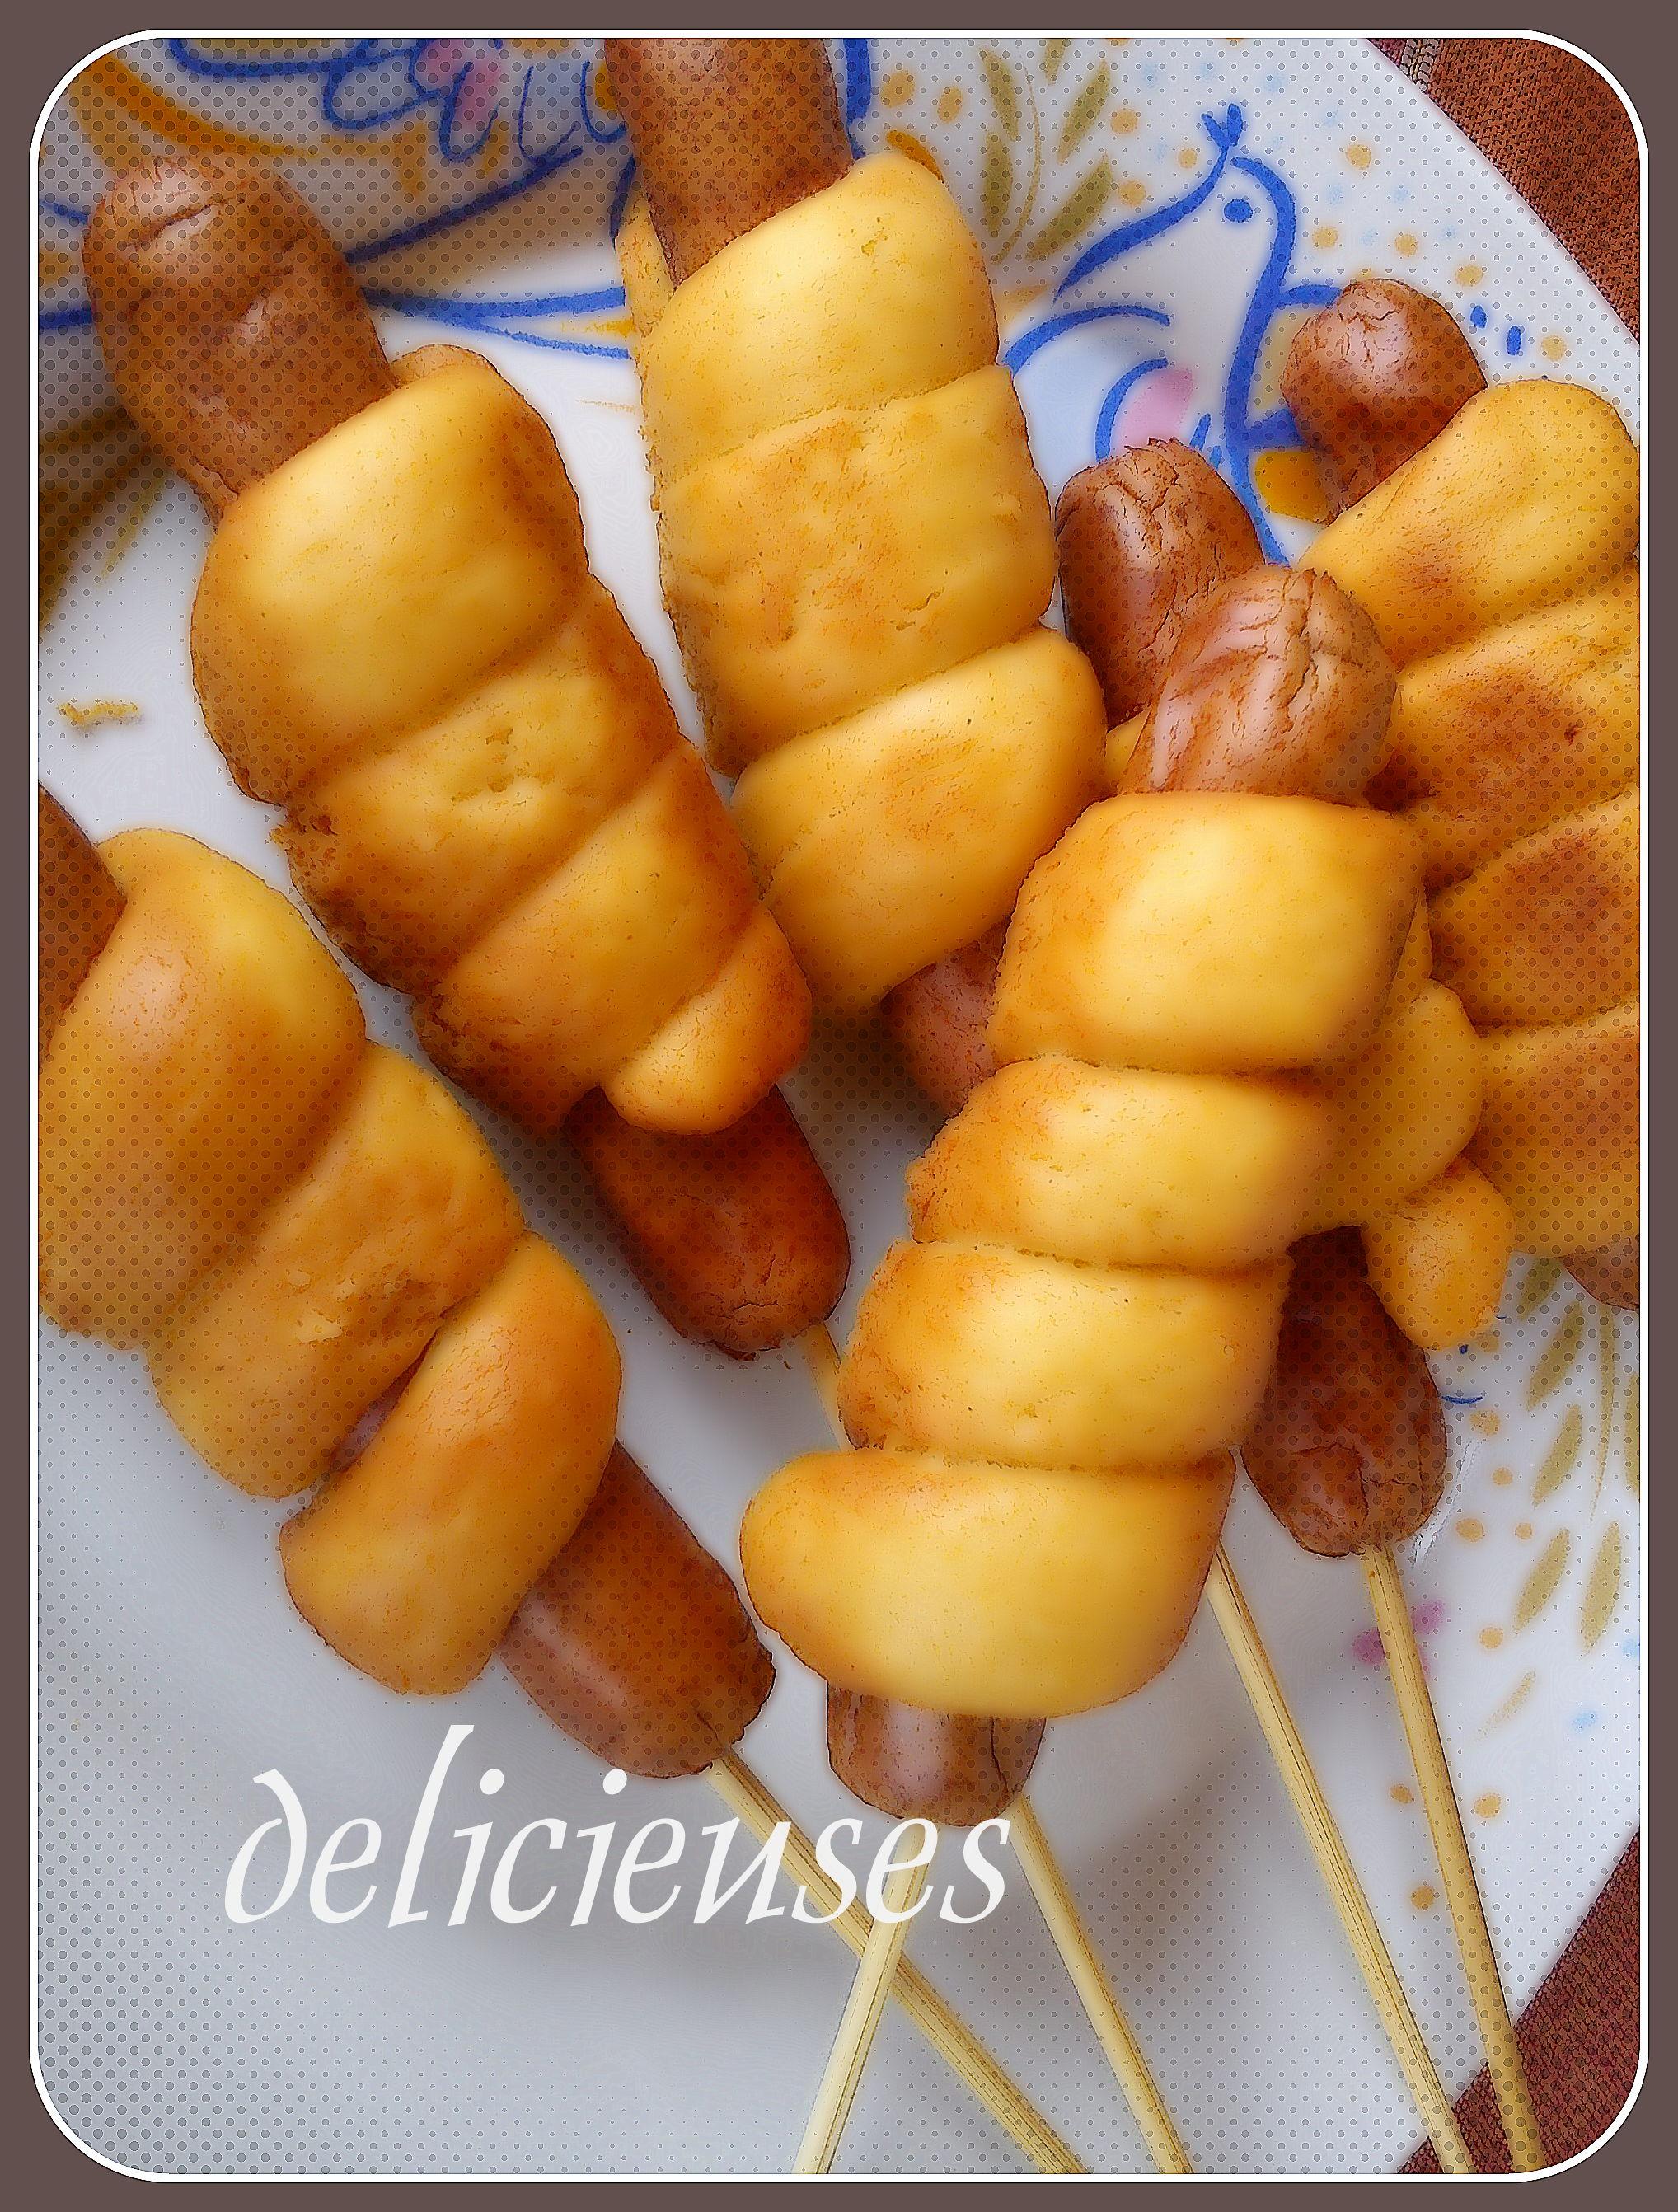 Corn dogs φούρνου με αλεύρι ολικής άλεσης 137